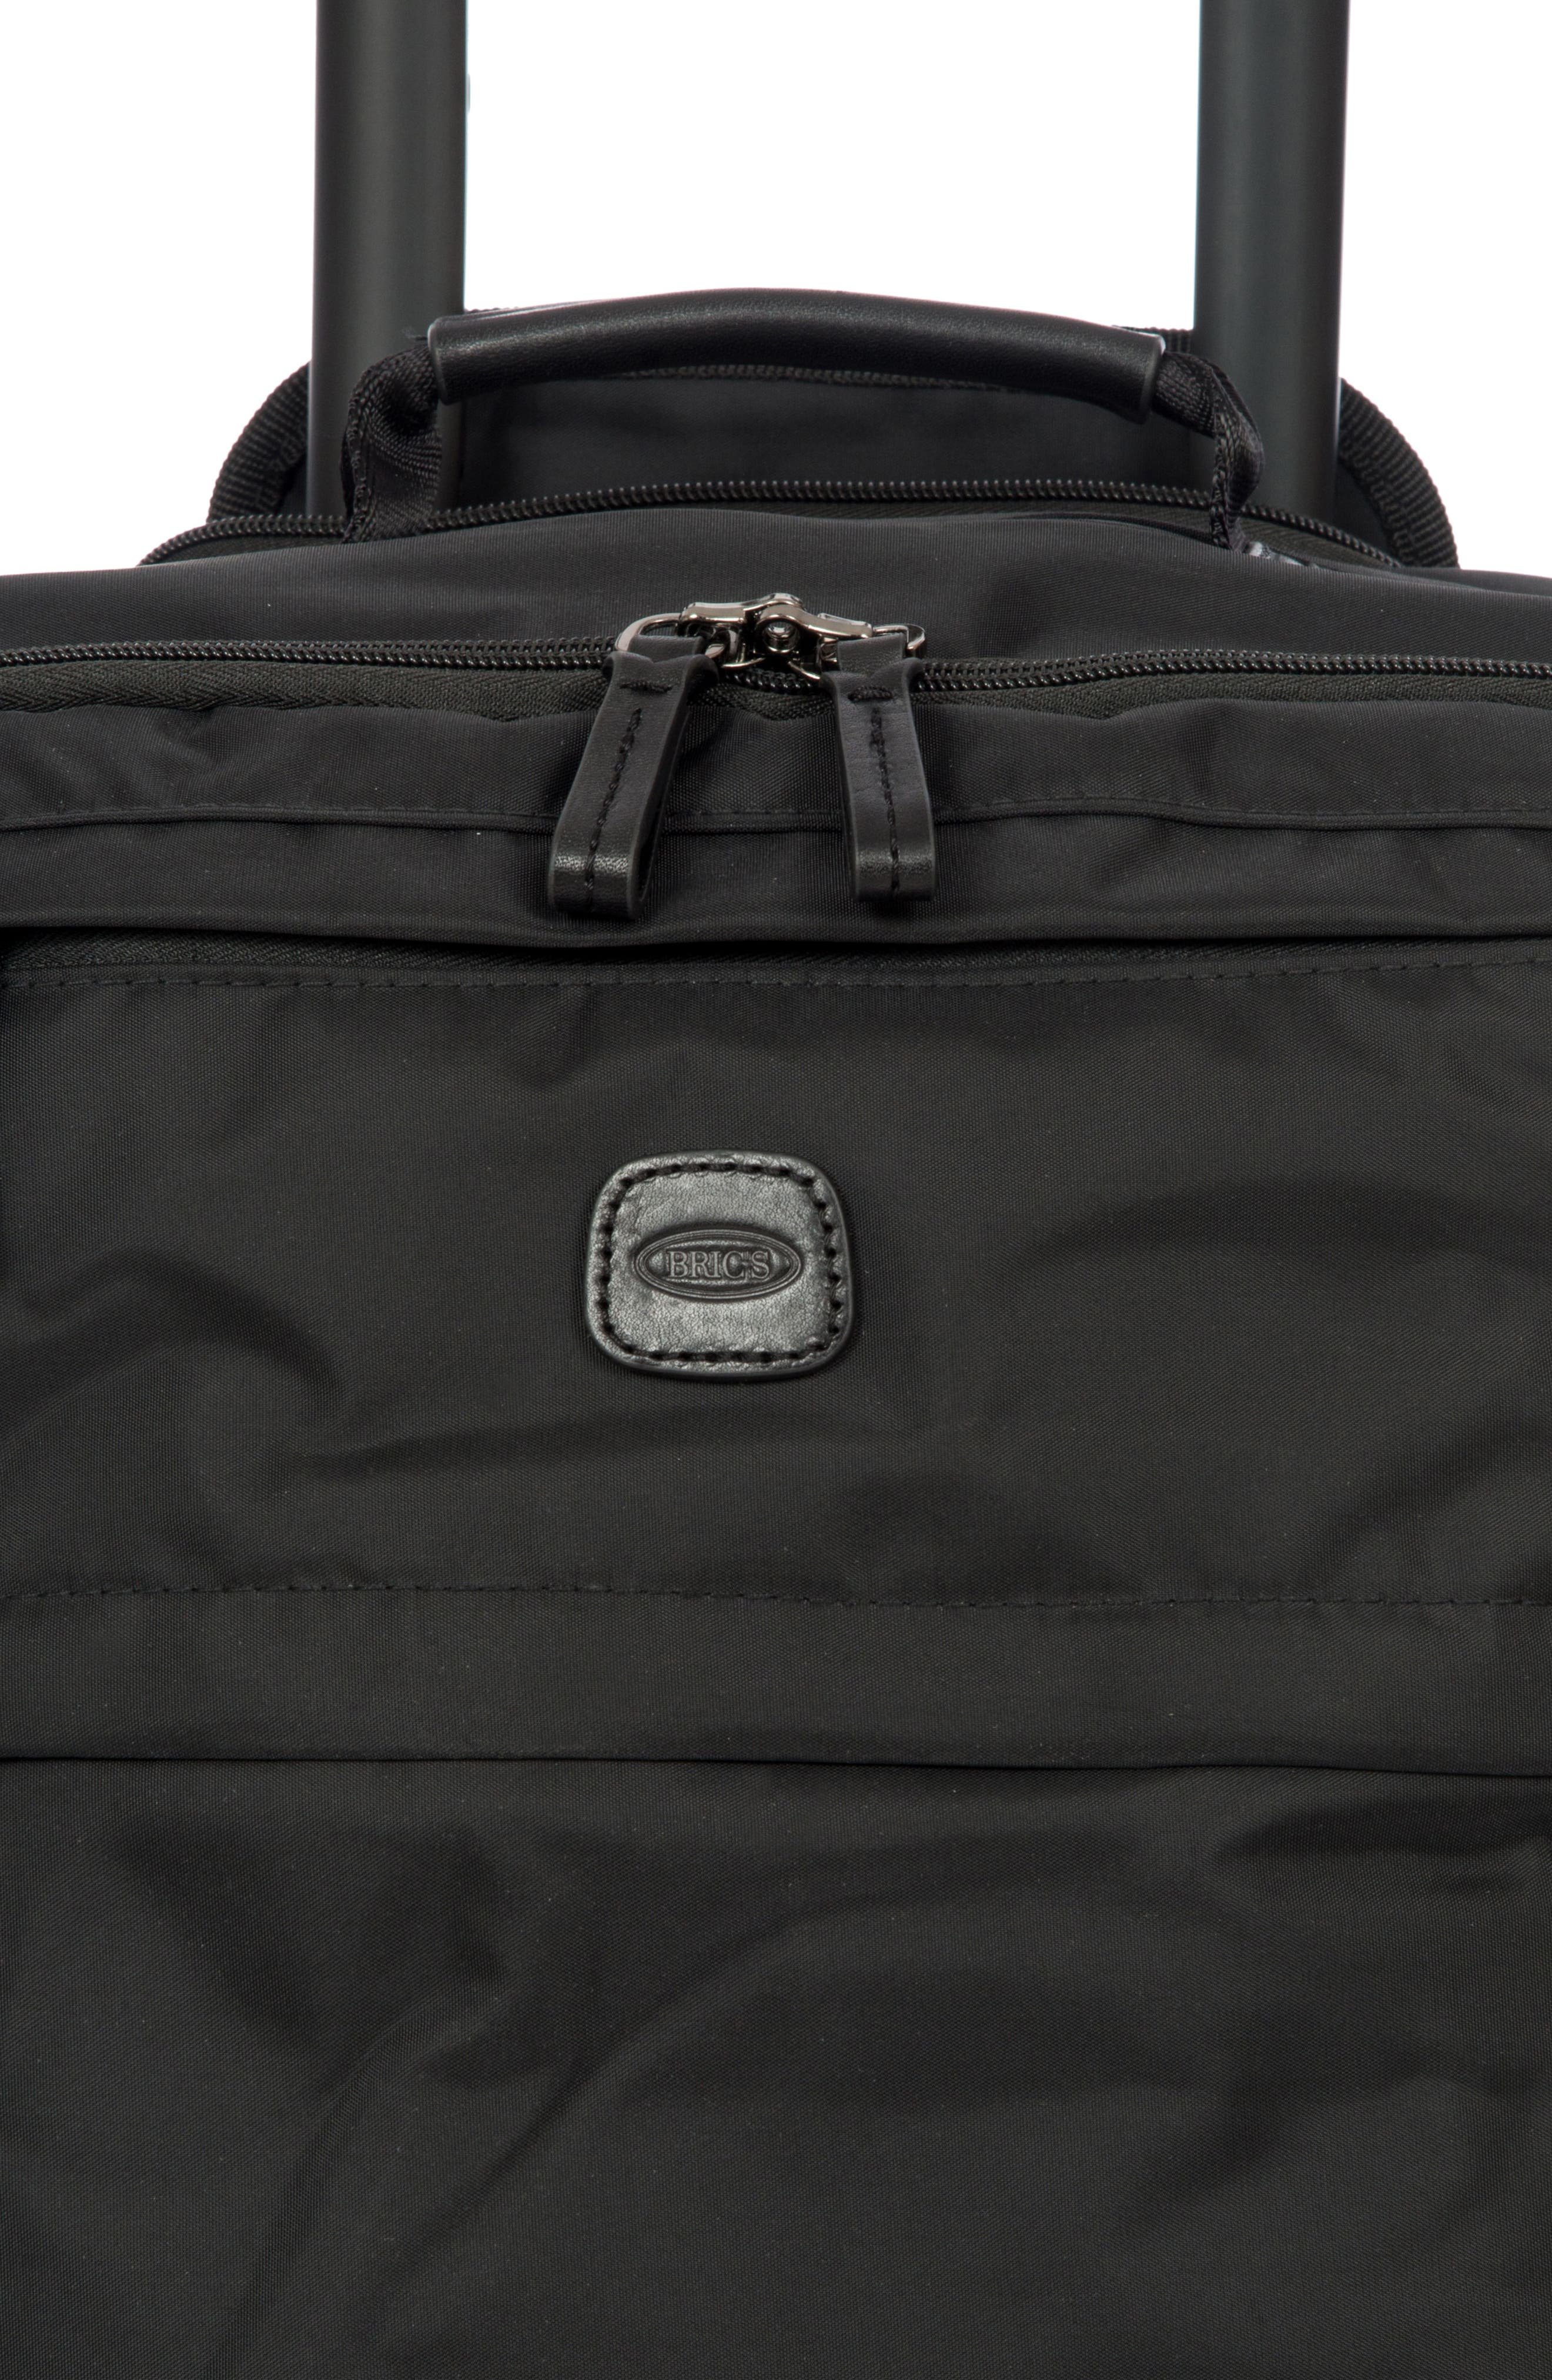 X-Bag 21-Inch Spinner Carry-On,                             Alternate thumbnail 5, color,                             Black/ Black